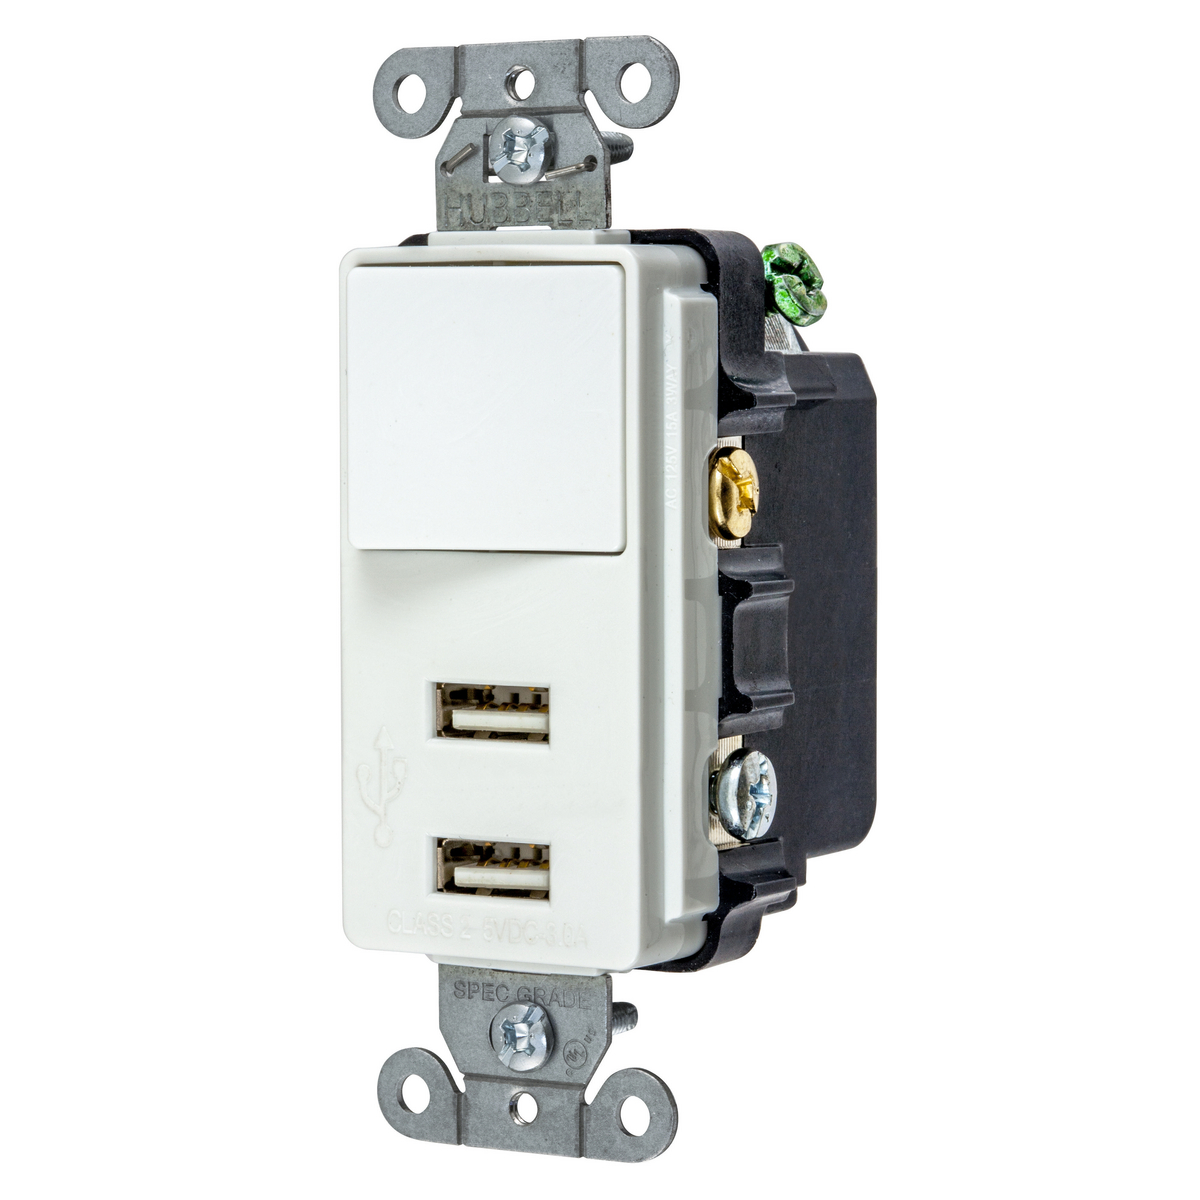 Hubbell Wiring United Electric 3 Way Key Switch Hubusb102w Usb Chrgr Sp3w 21a 5v Two Portwhite Usb102w